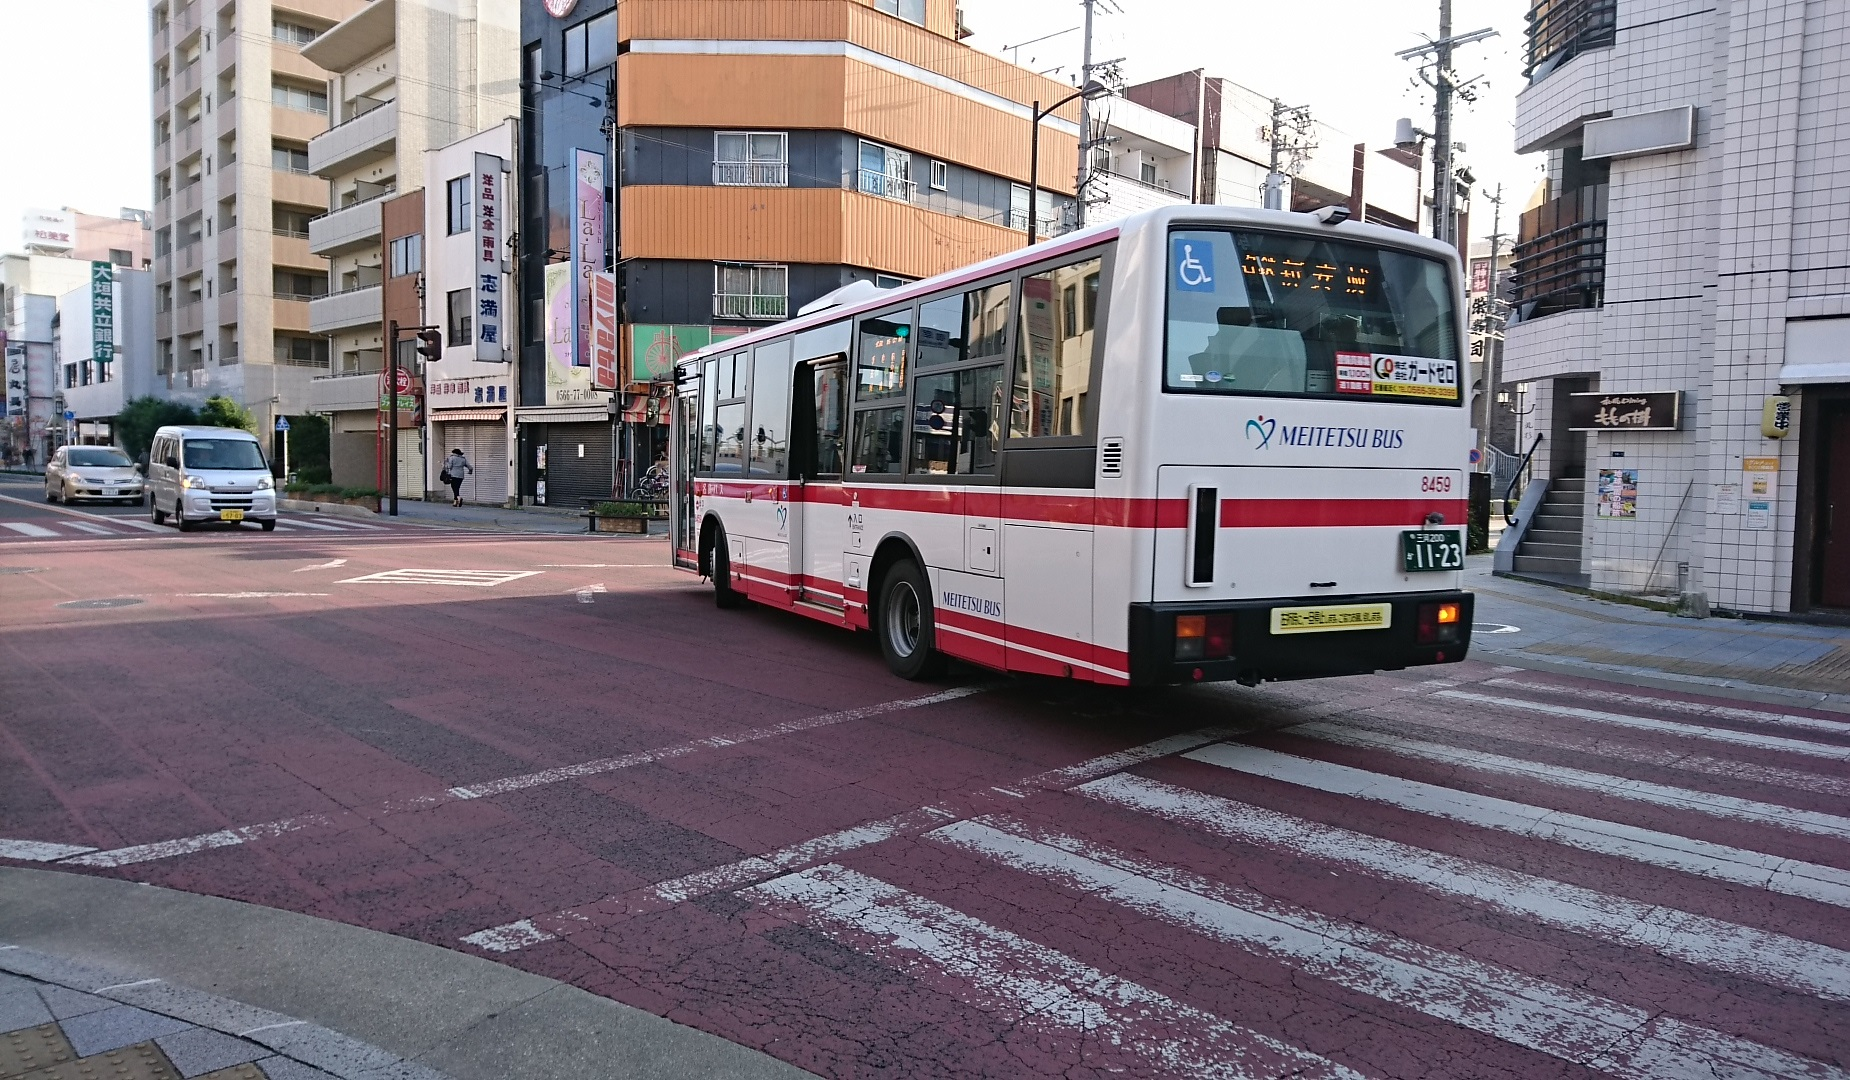 2016.11.07 (2) 御幸本町交差点 - 名鉄バス 1850-1080